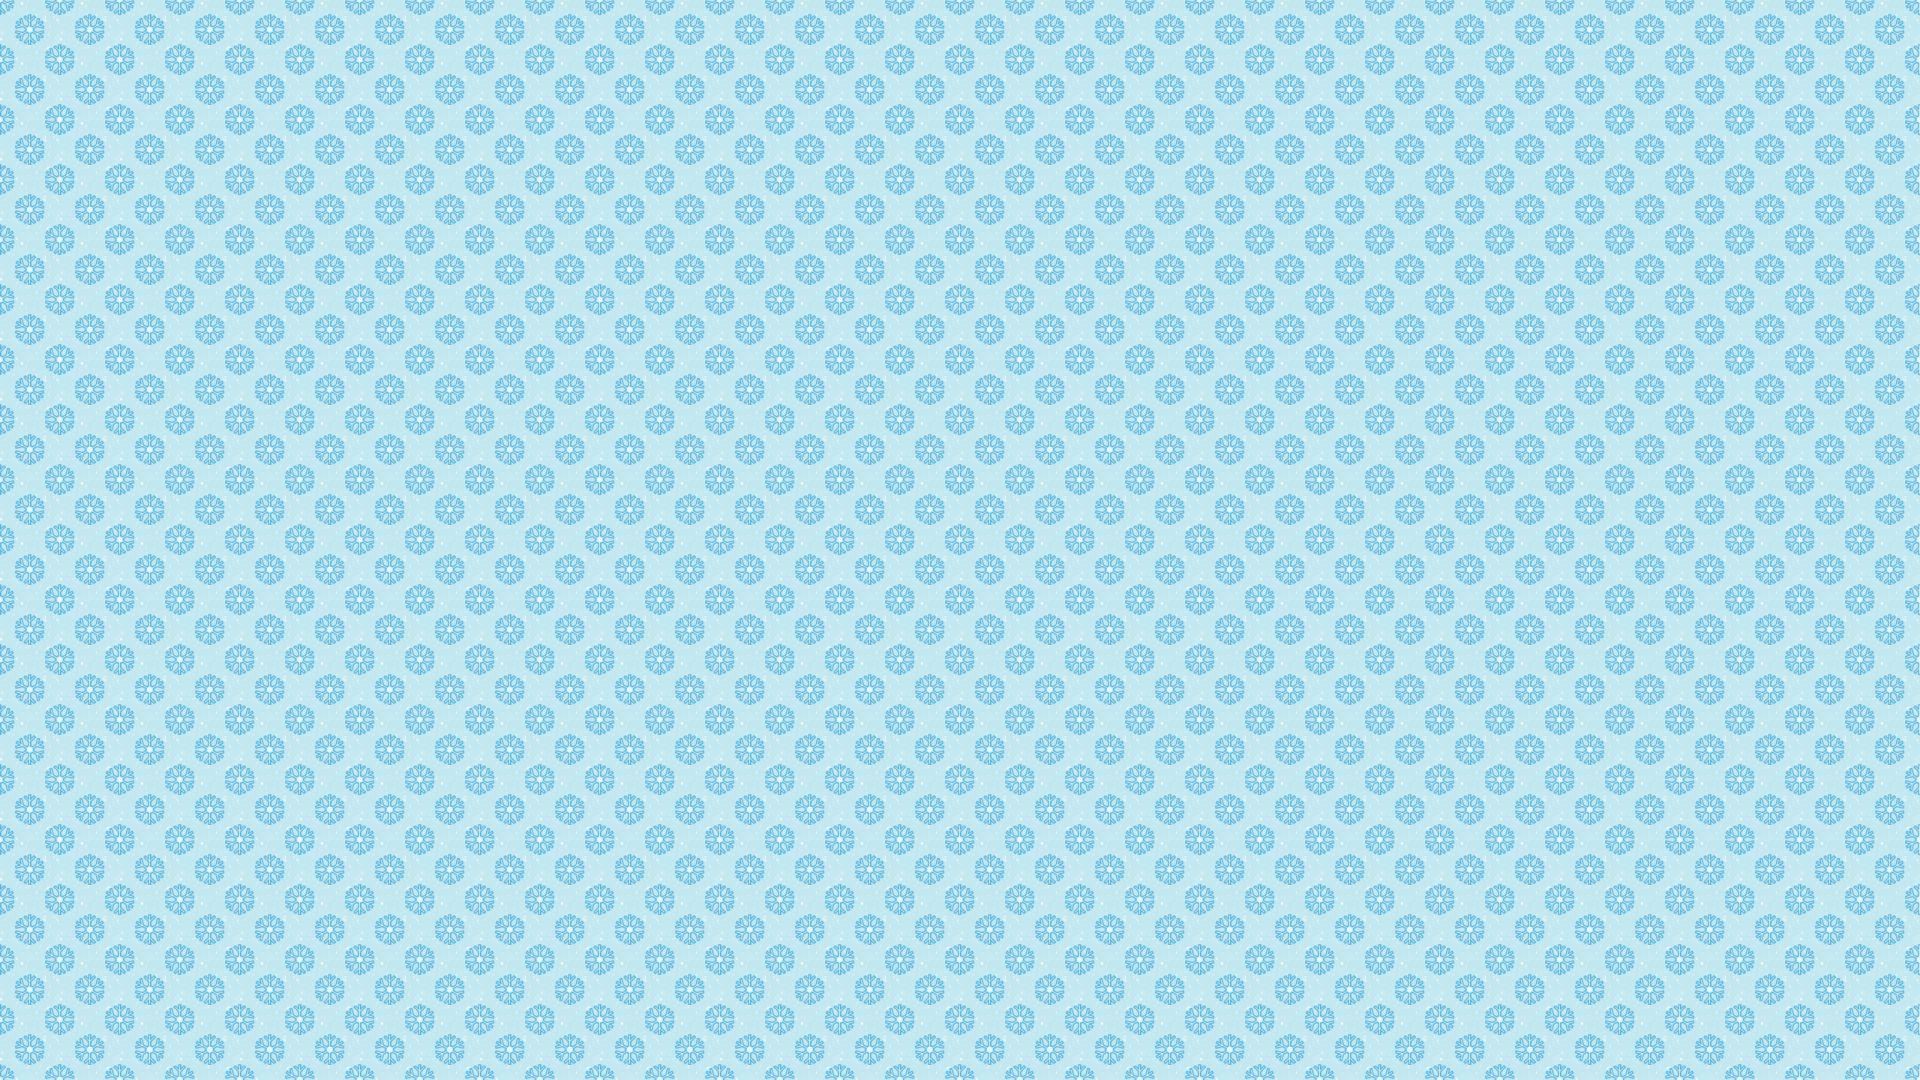 Cute Blue download wallpaper image